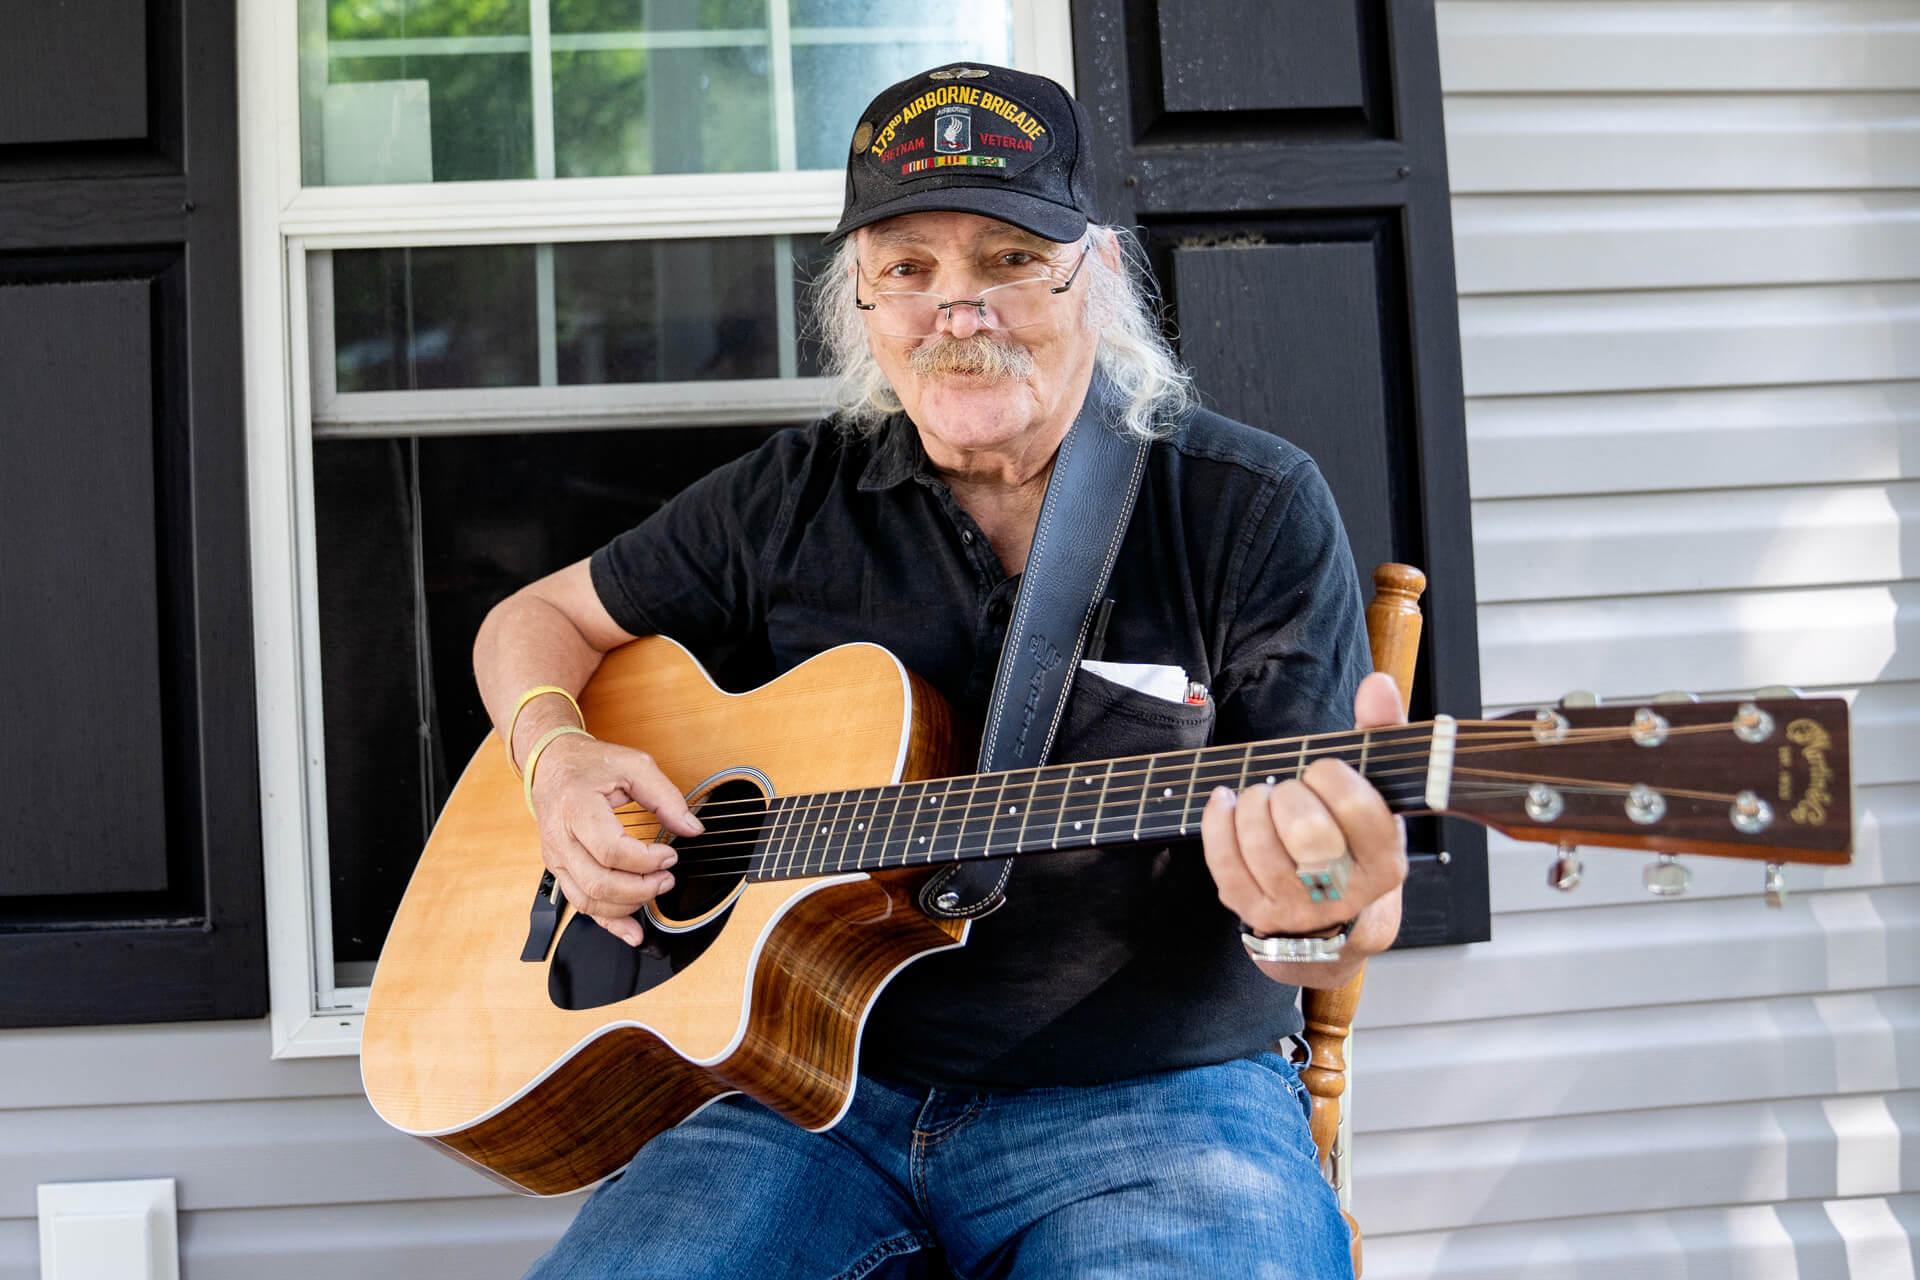 Veteran playing guitar